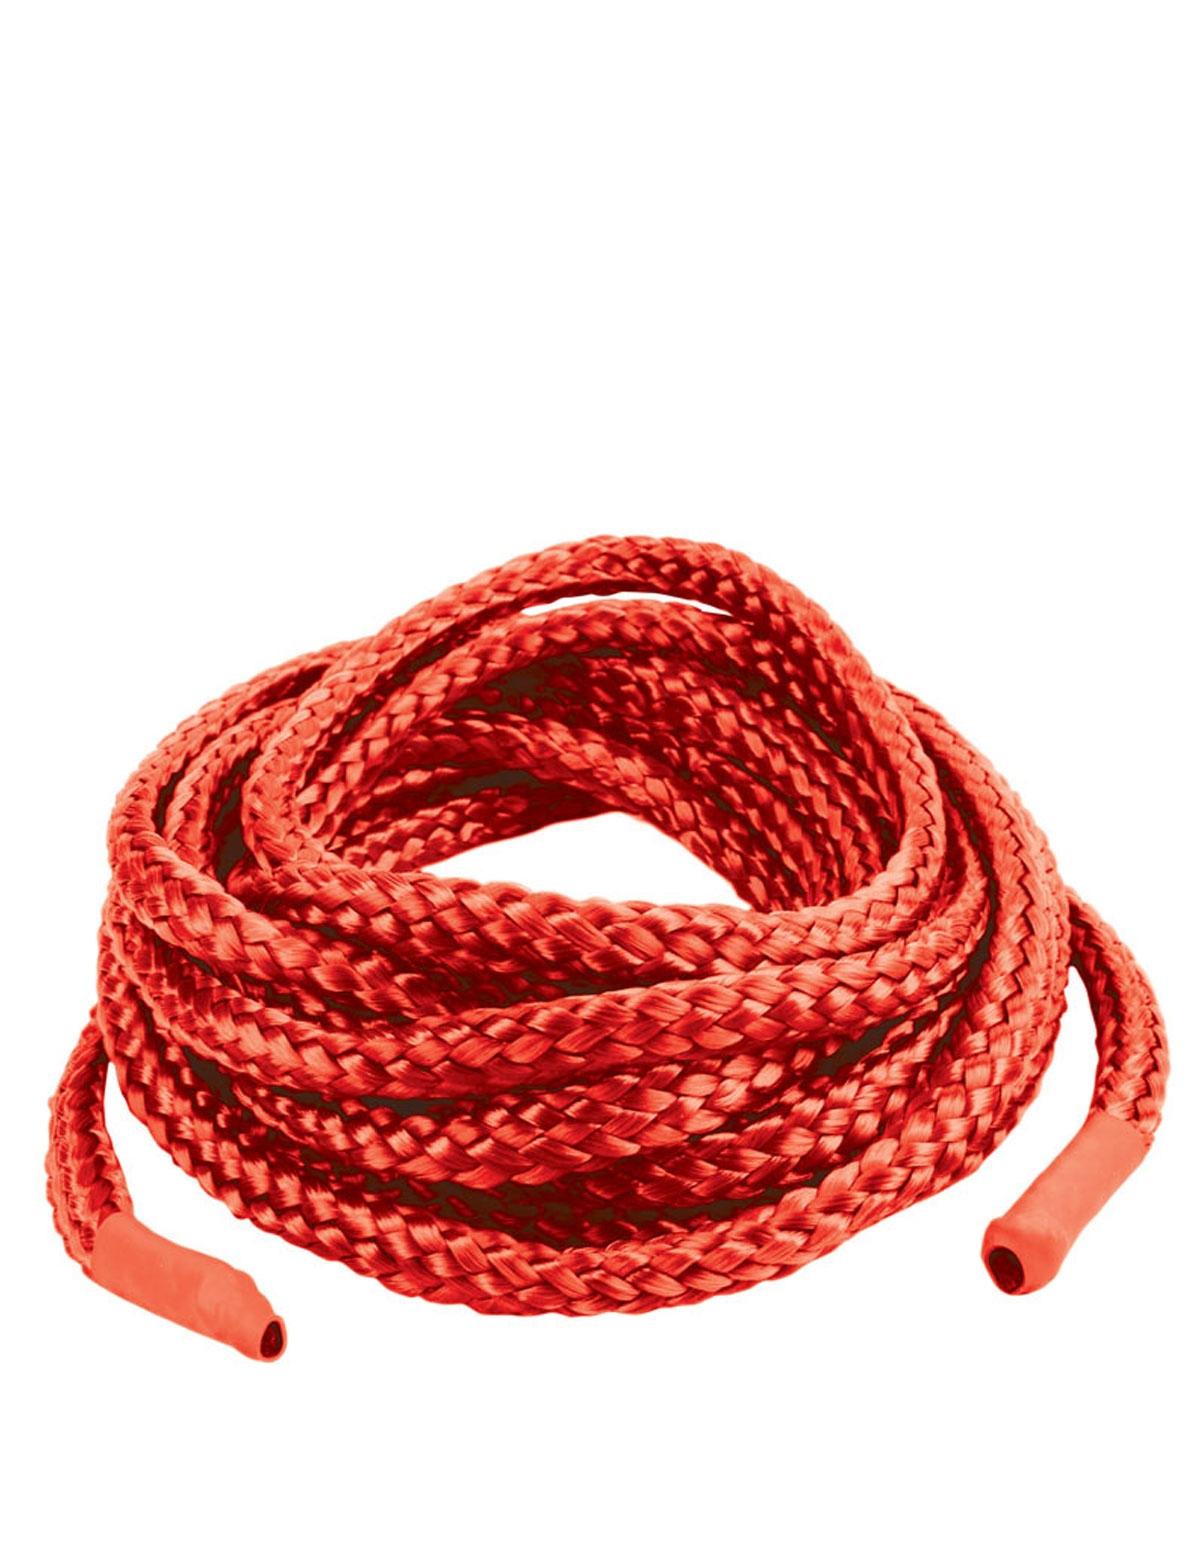 Japanese Silk Love Rope 10 Ft.